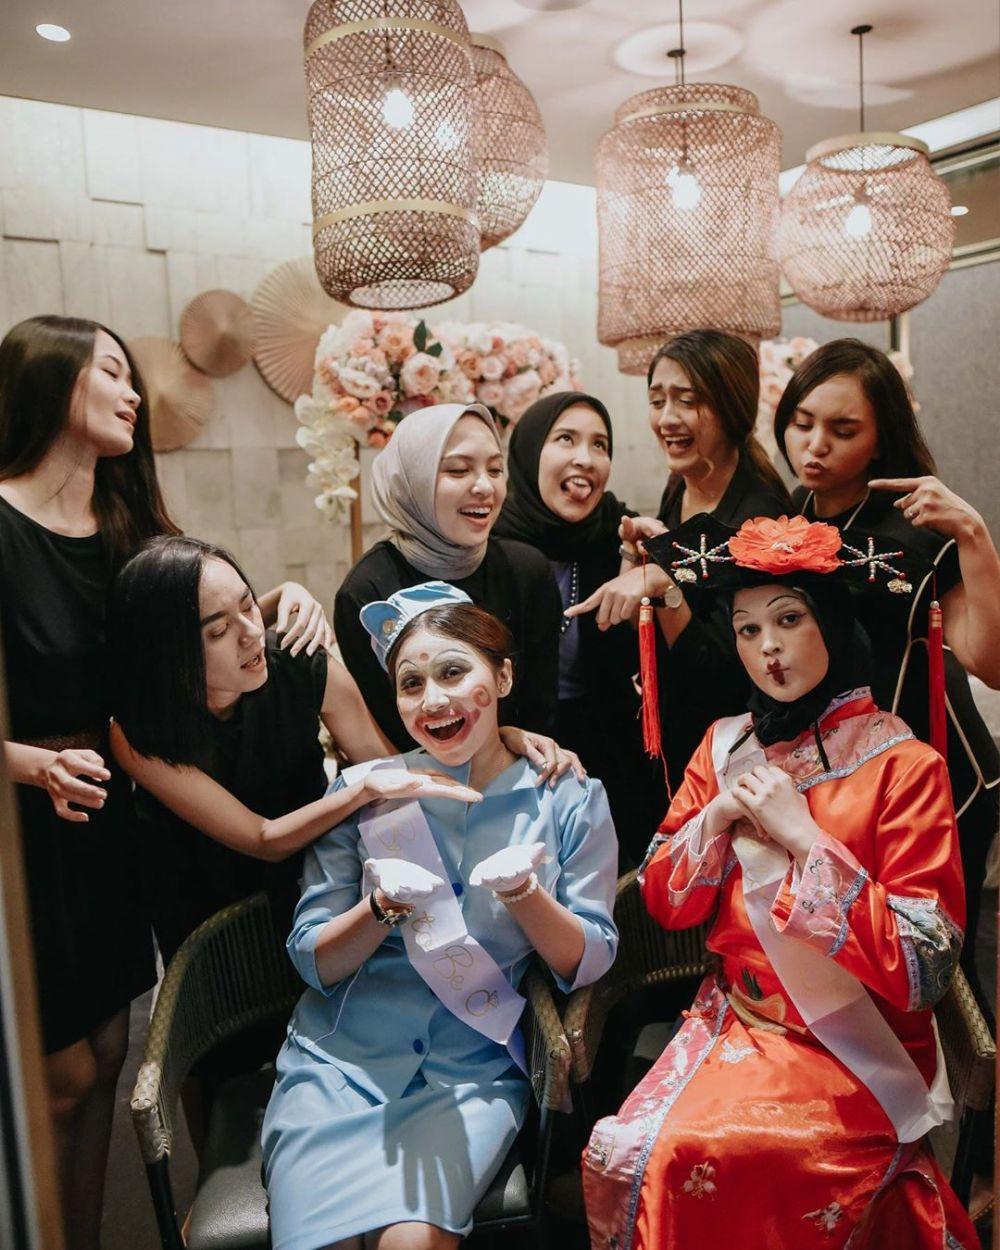 Bridal shower seleb cantik ini bertema tradisional © 2019 brilio.net